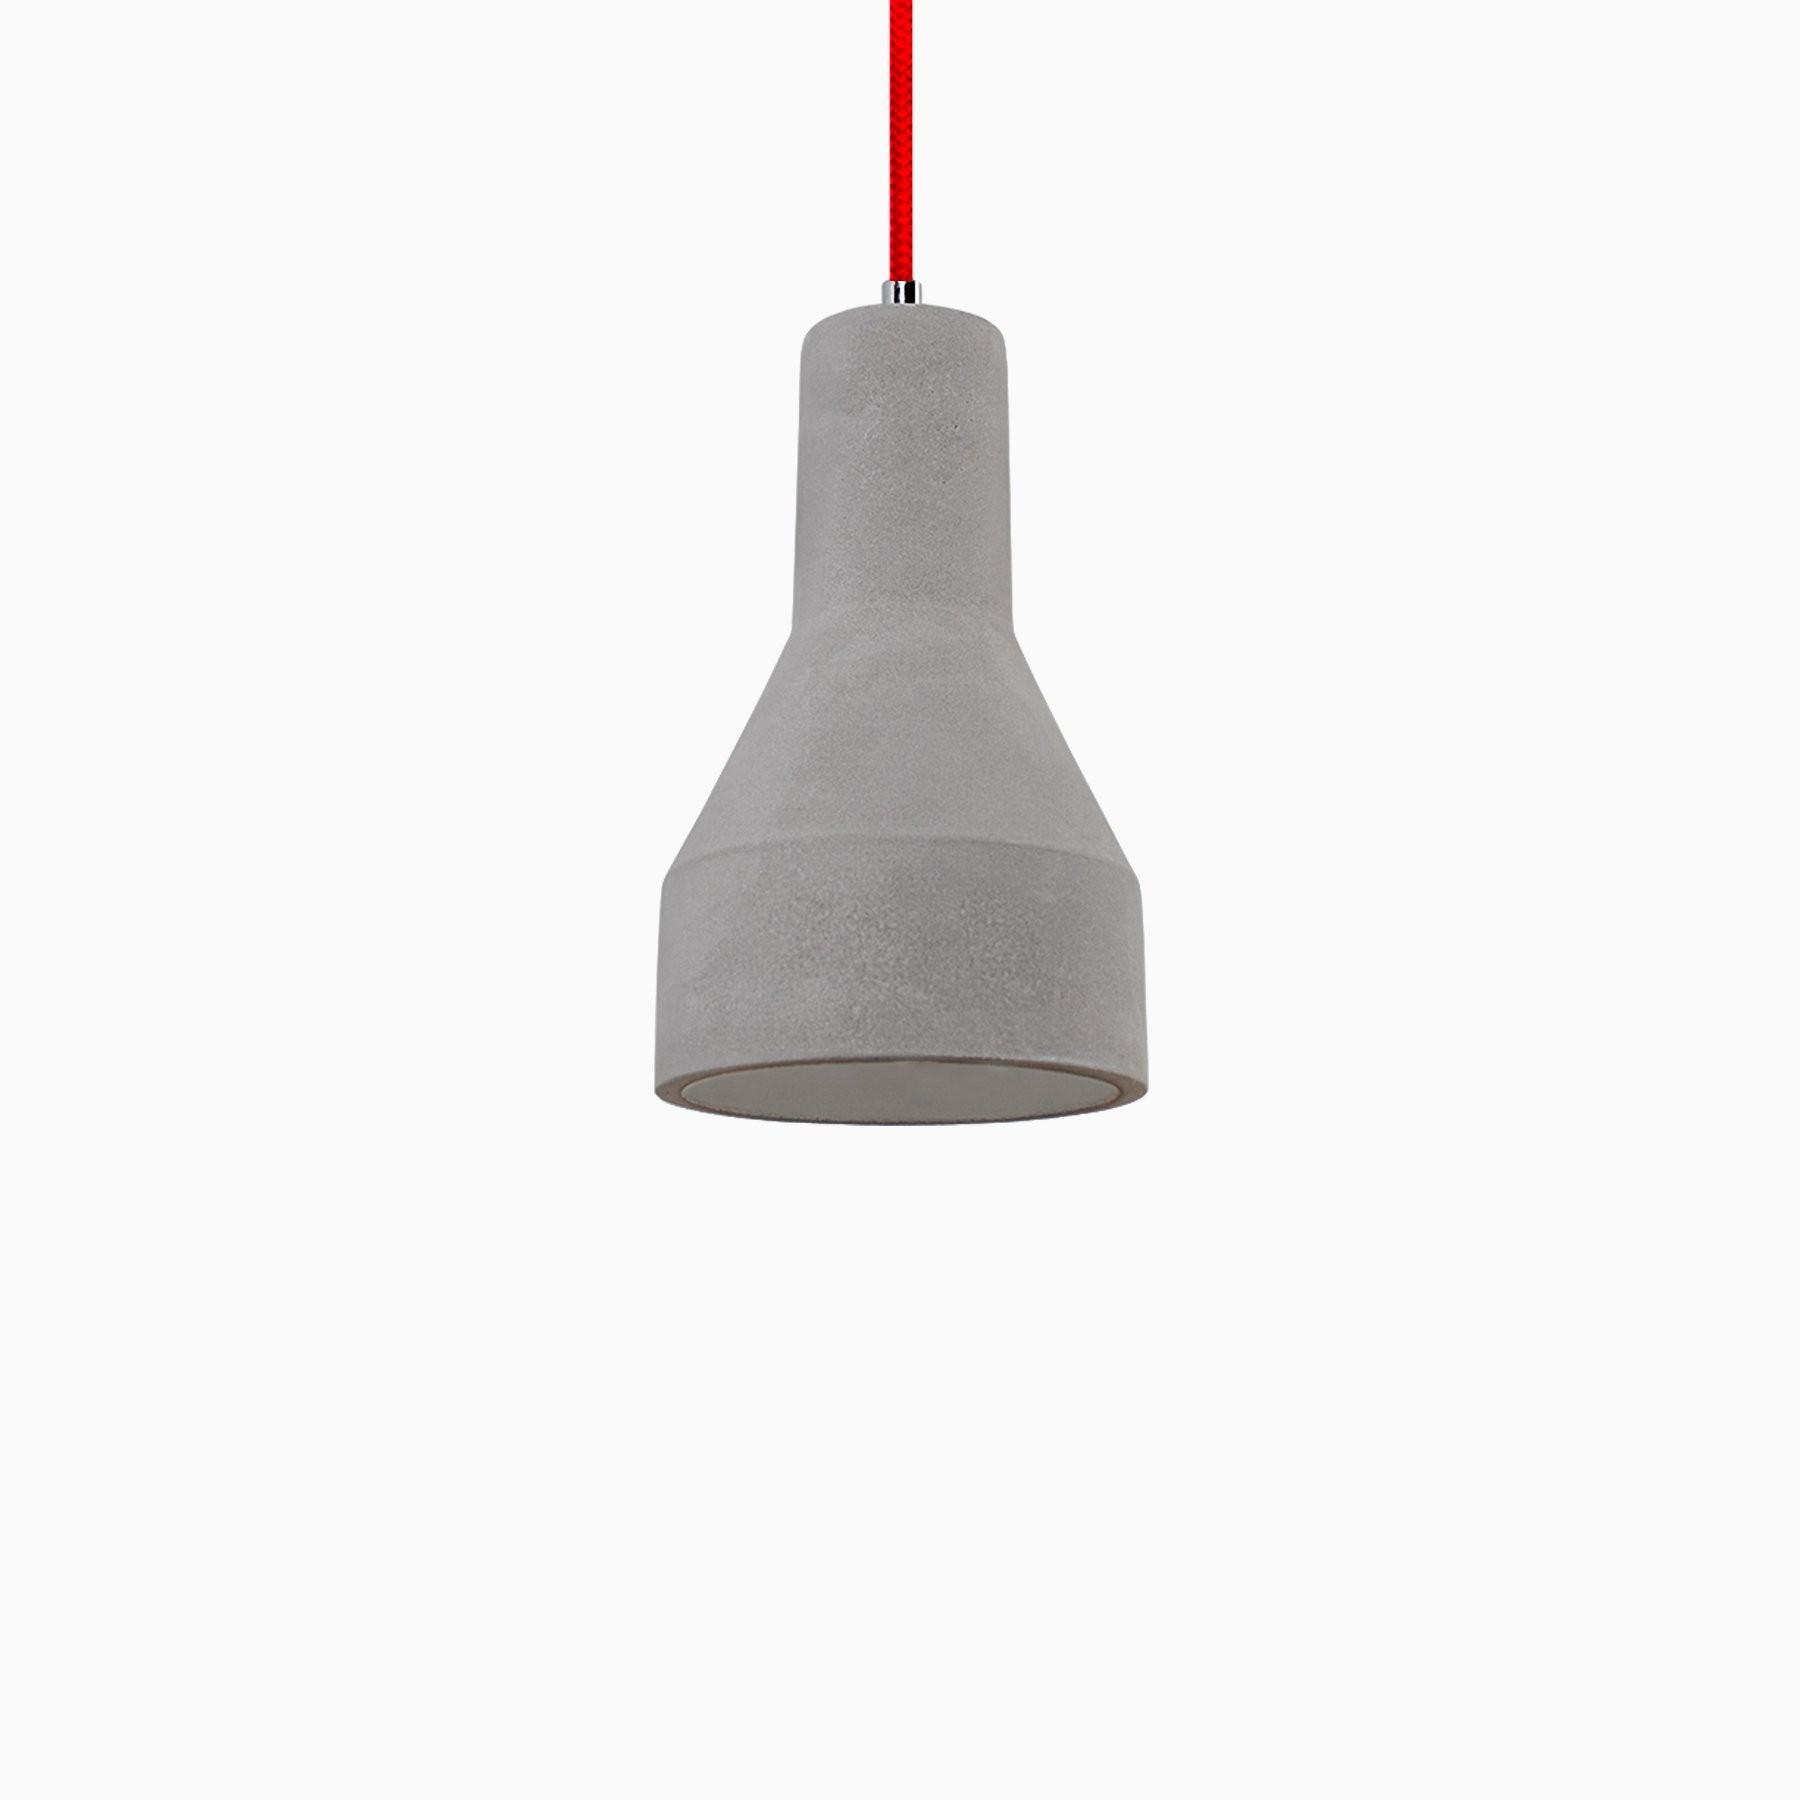 promo code a4634 3ccbf Amelia Concrete Pendant Light with Red Cord